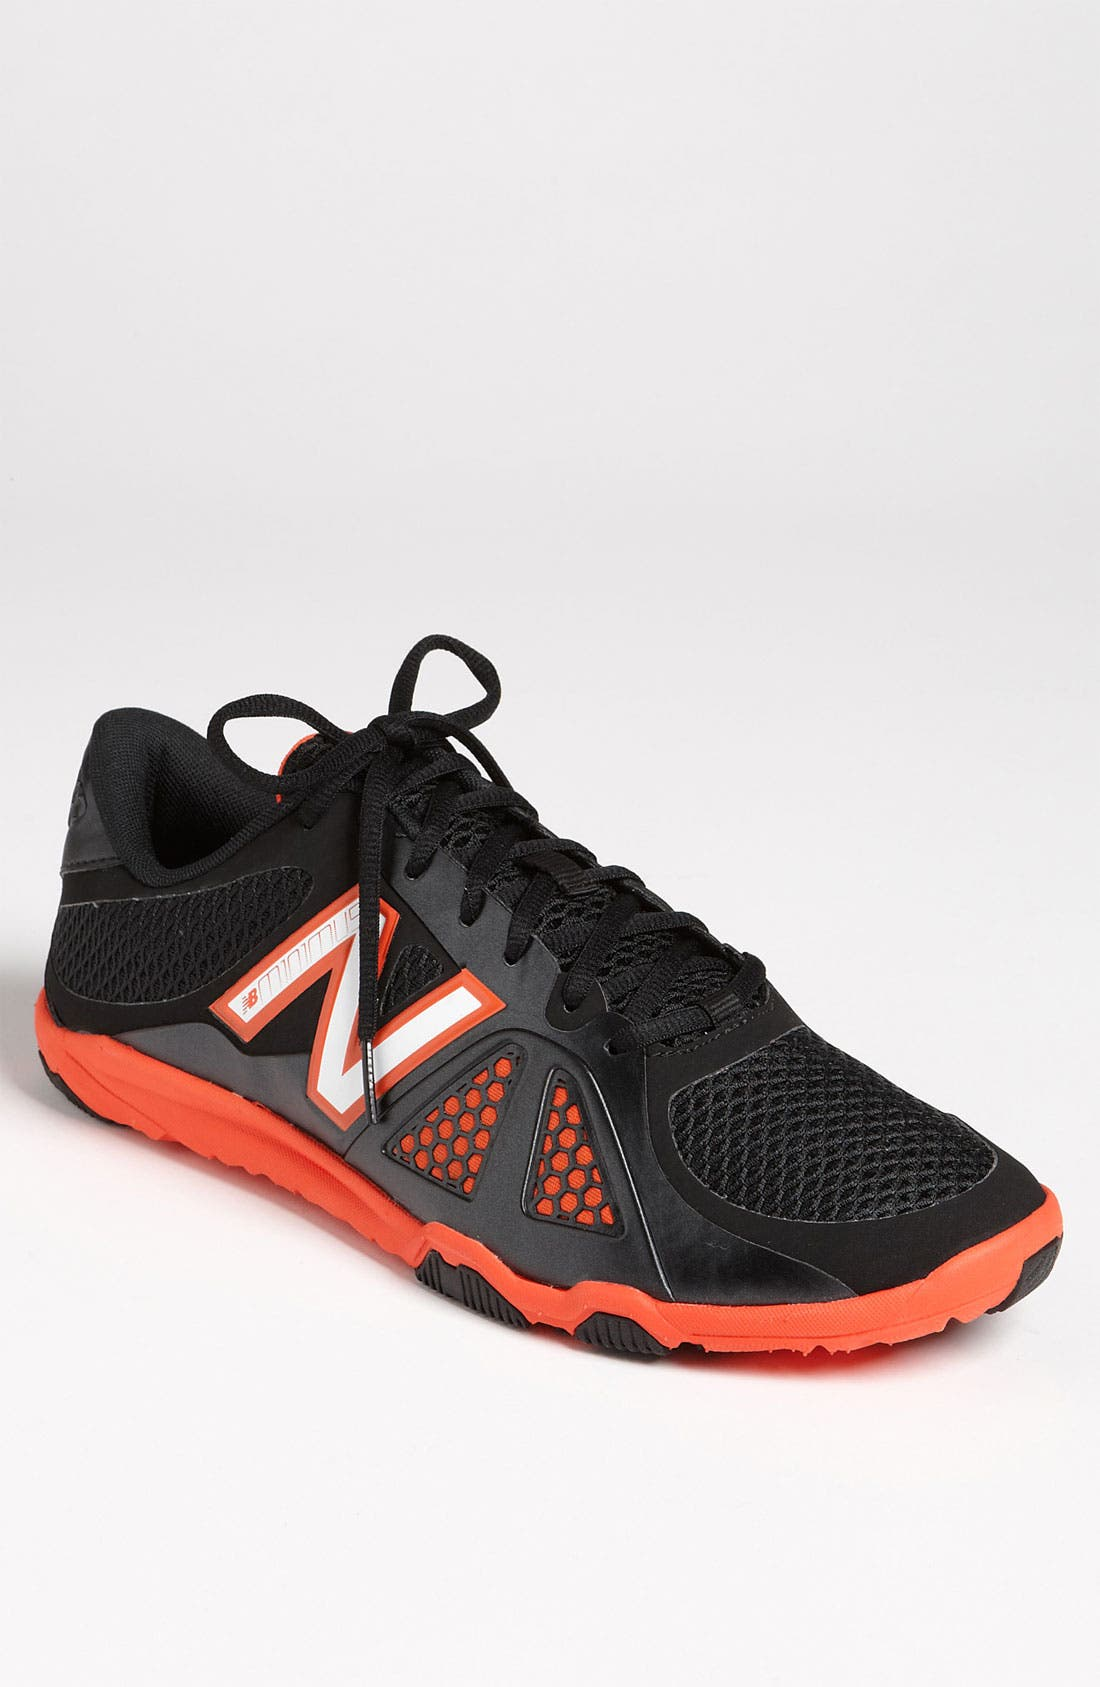 Main Image - New Balance 'Minimus' Training Shoe (Men)